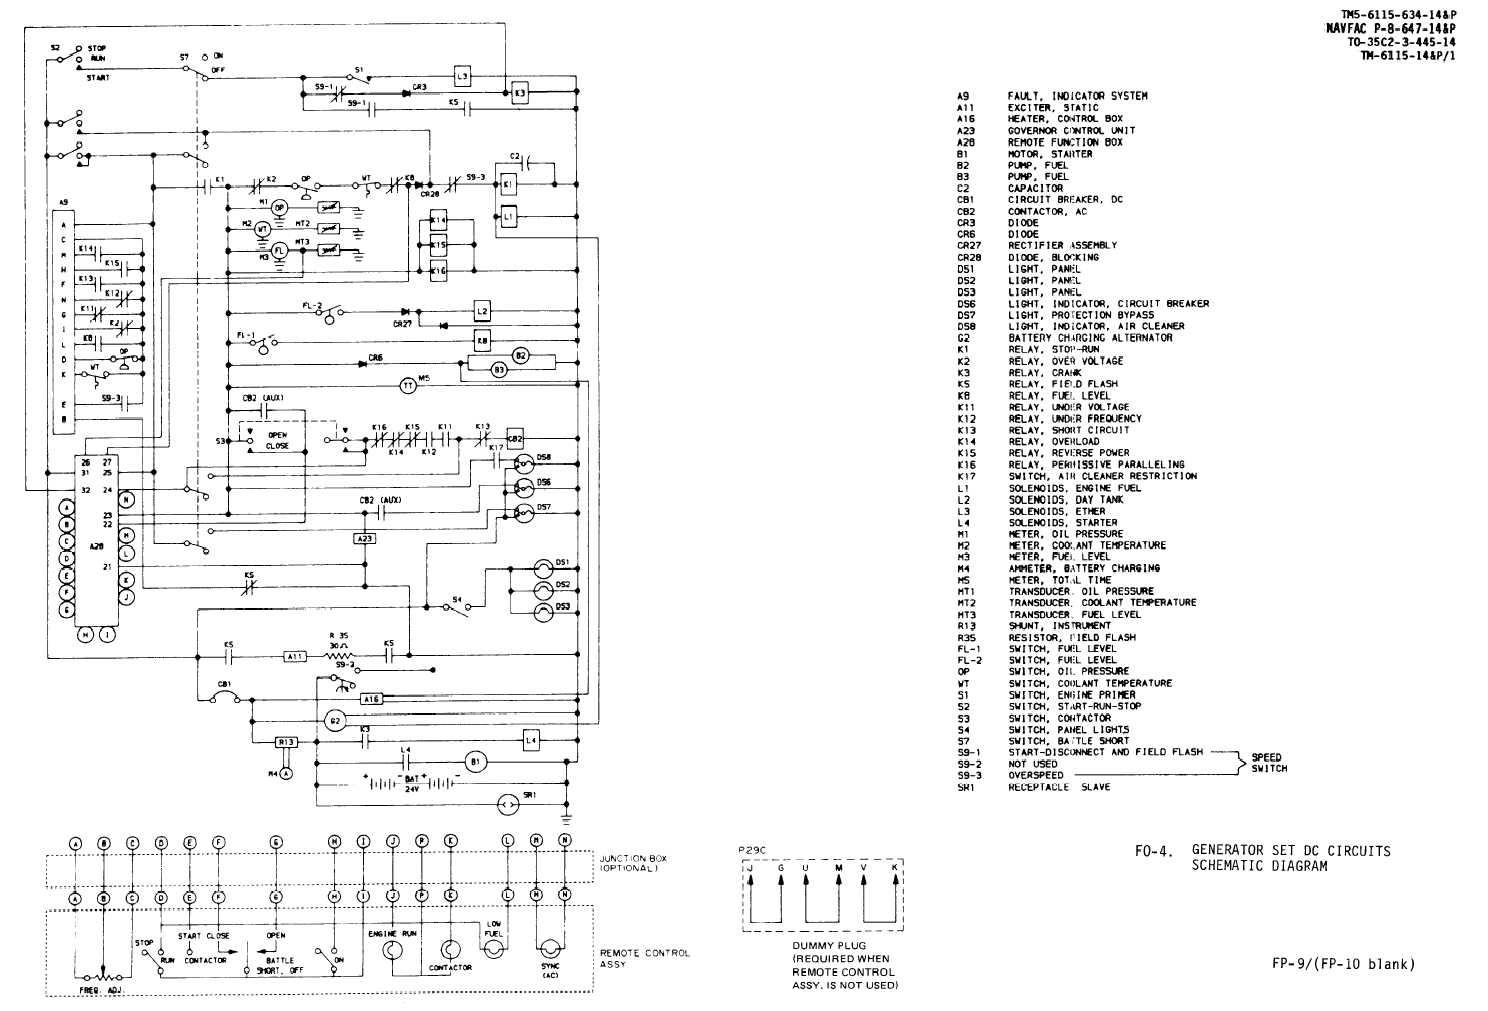 FO-4. generator set dc circuits schematic diagram